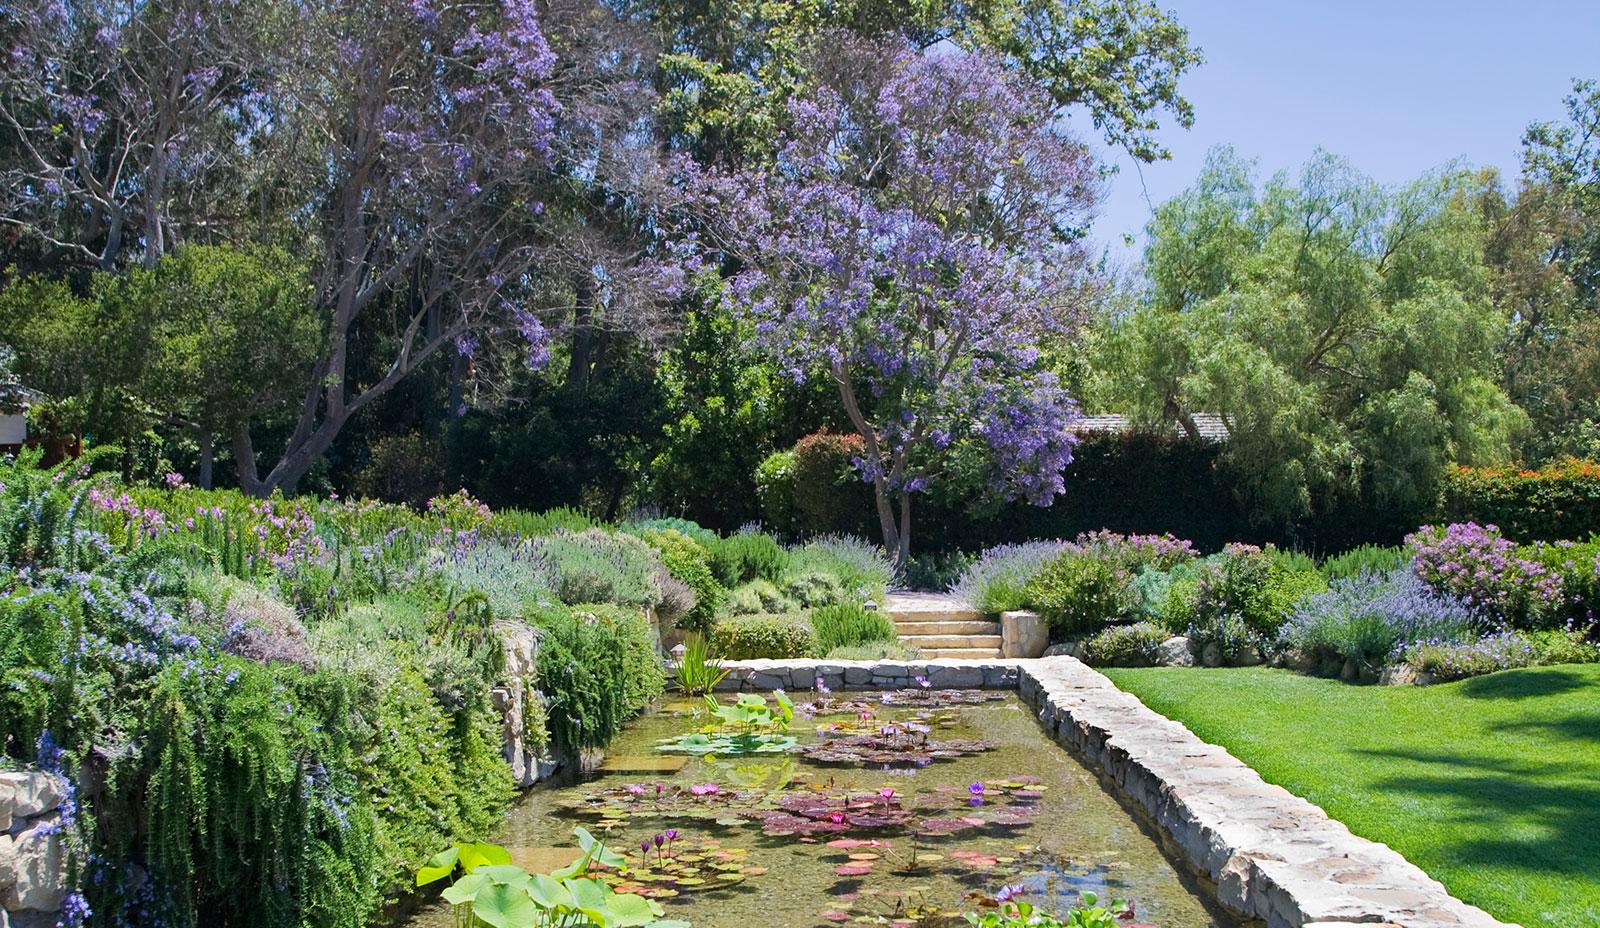 Photo: http://www.sanysidroranch.com/santa-barbara-gardens